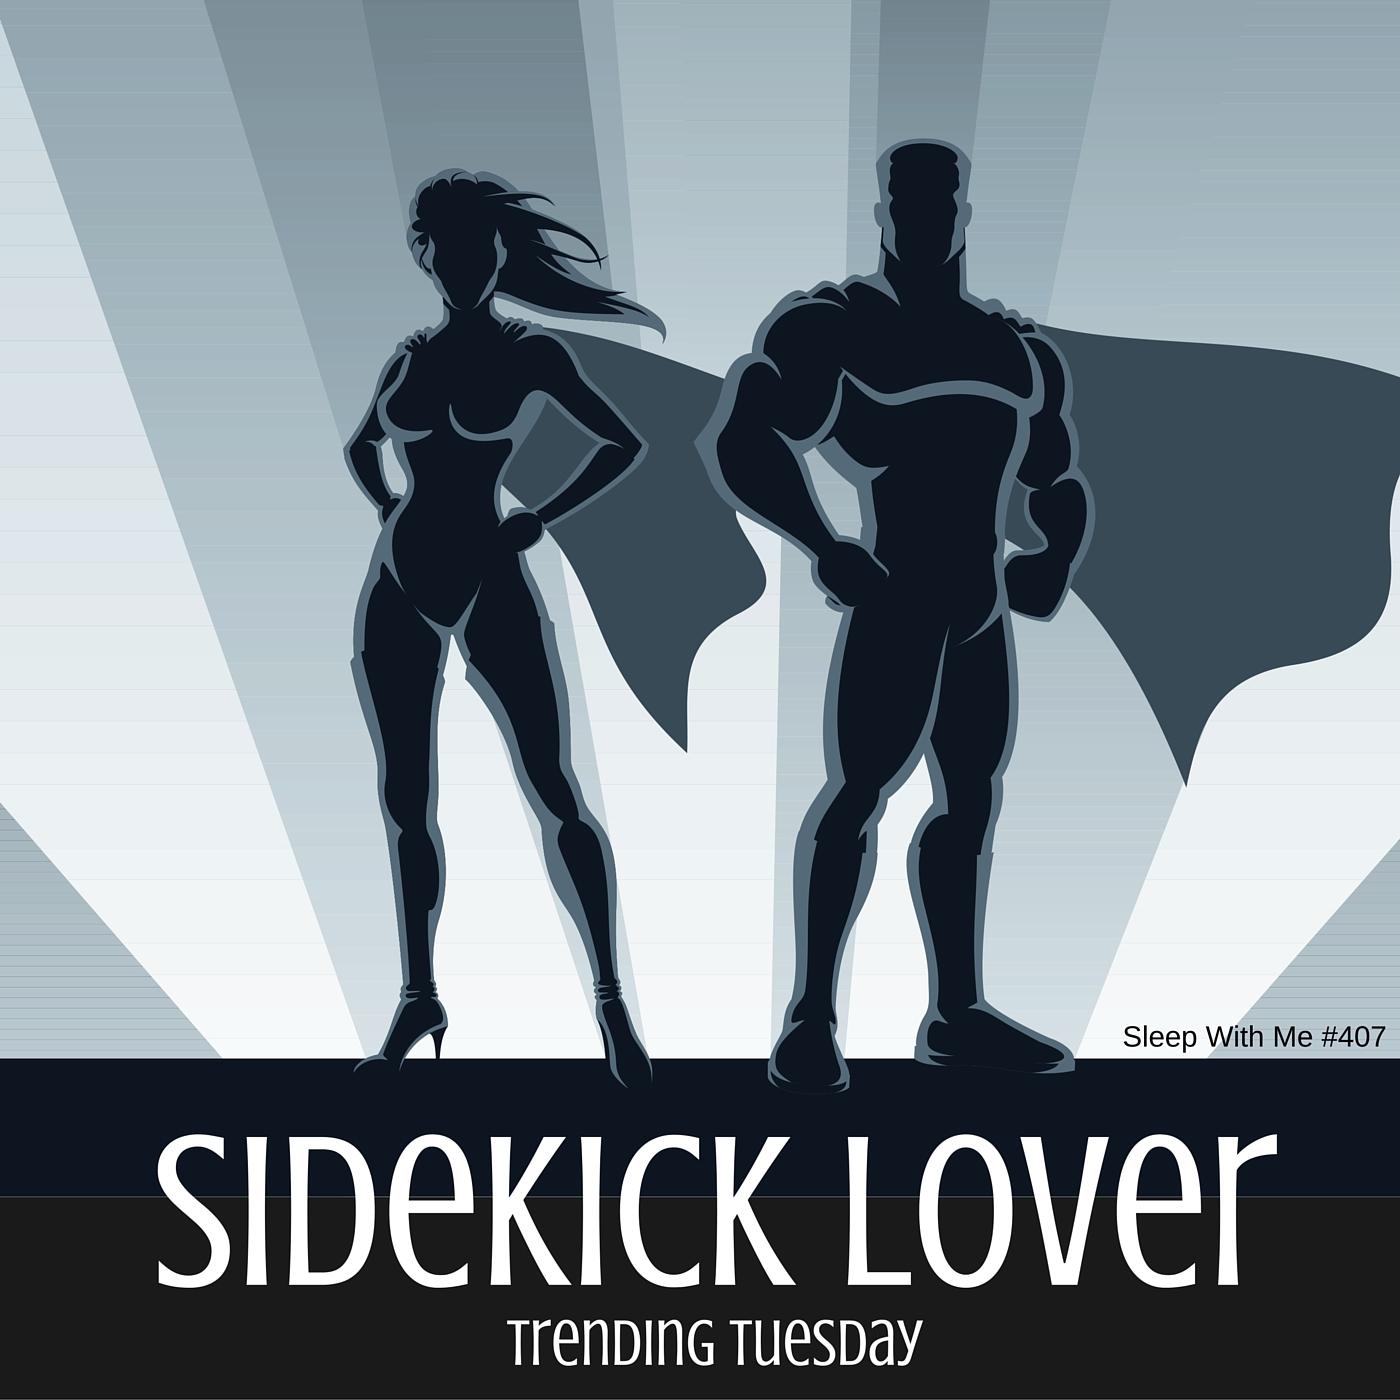 Sidekick Lover | Trending Tuesdays | Sleep With Me #407